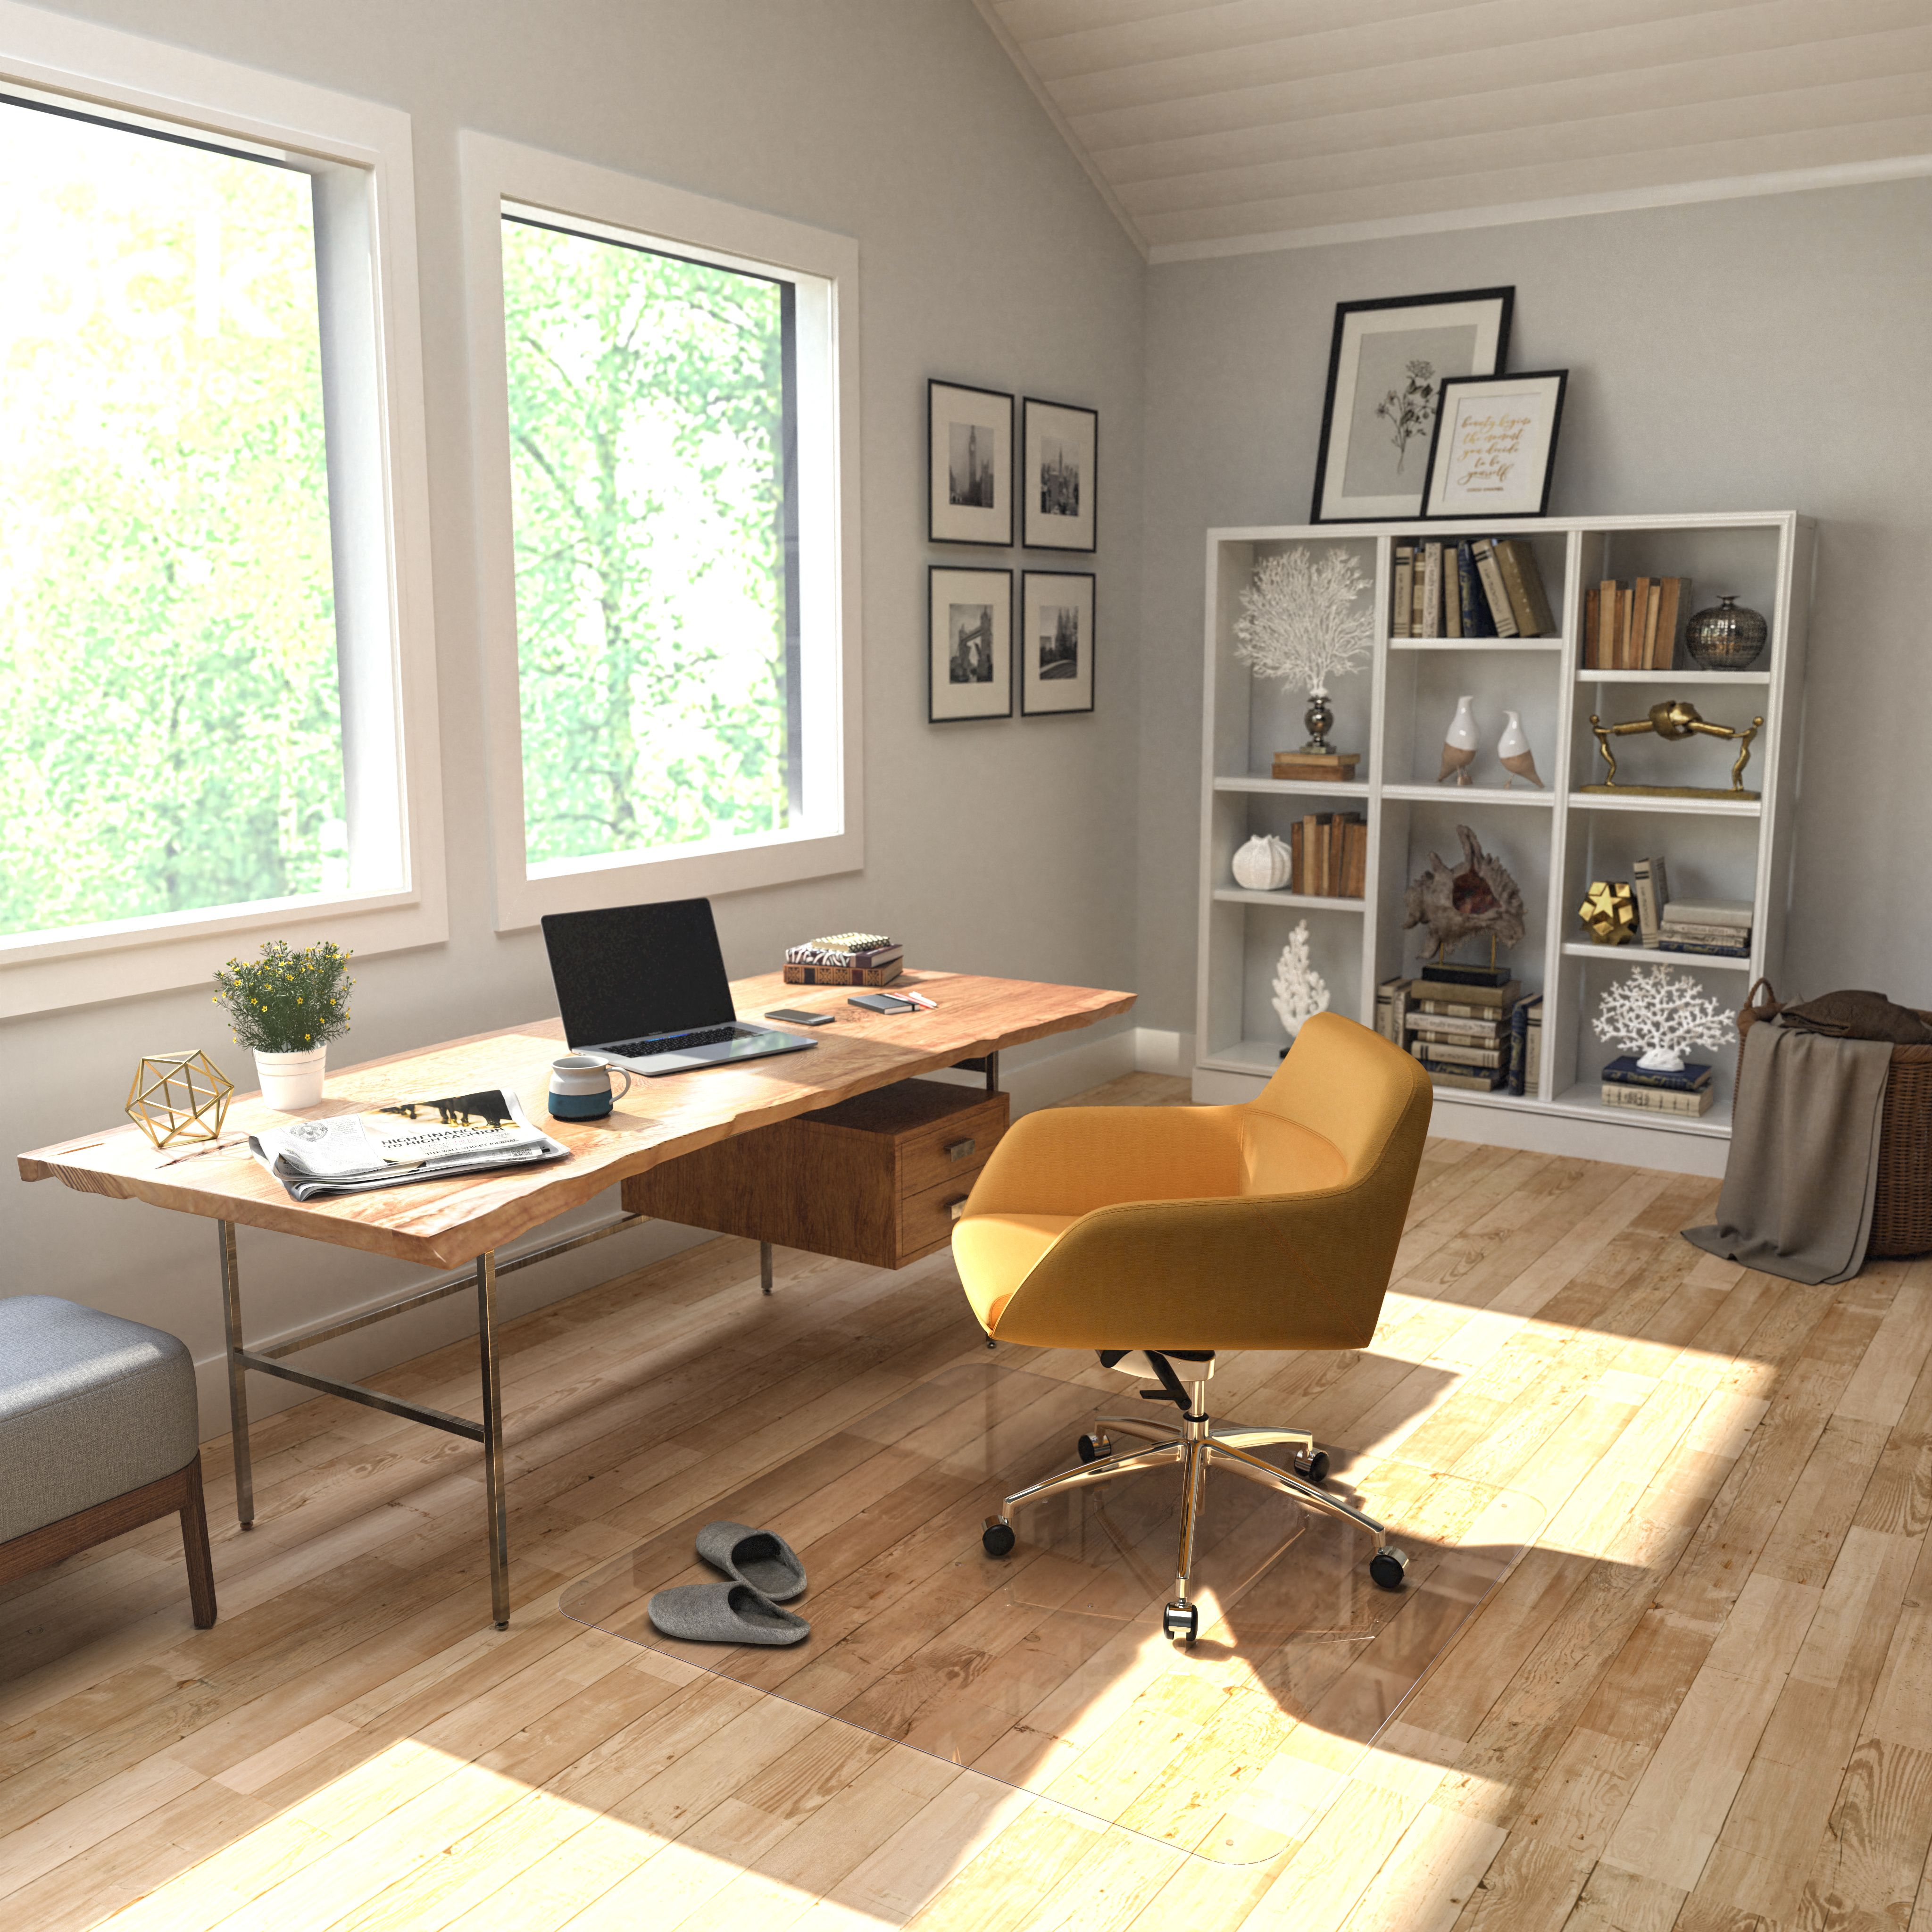 ICYMI Universal 45 x 53 Home Office Floor Chair Mat Low